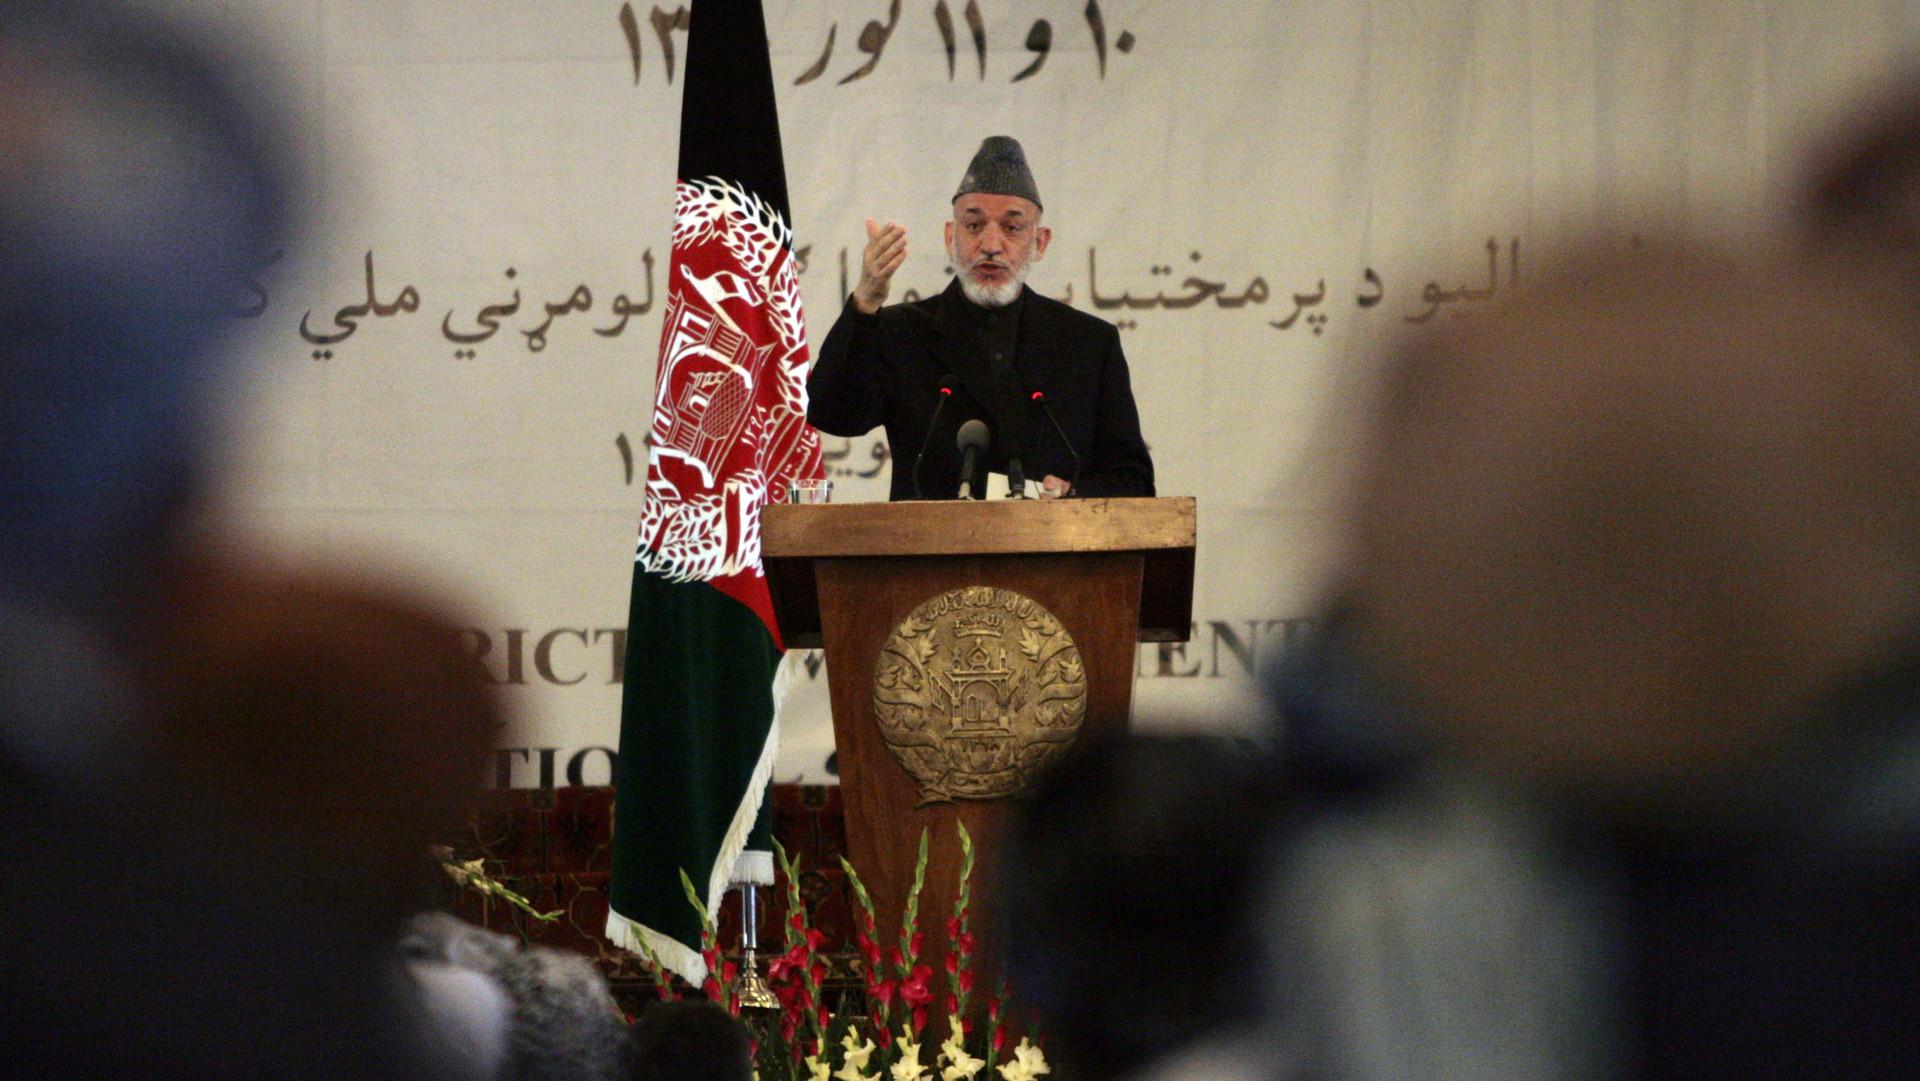 Президент Афганистана Хамид Карзай выступает в президентском дворце в Кабуле в Афганистане после смерти Бен Ладена. 2 мая 2011 г. Фото: © AP Photo/Hossein Fatemi